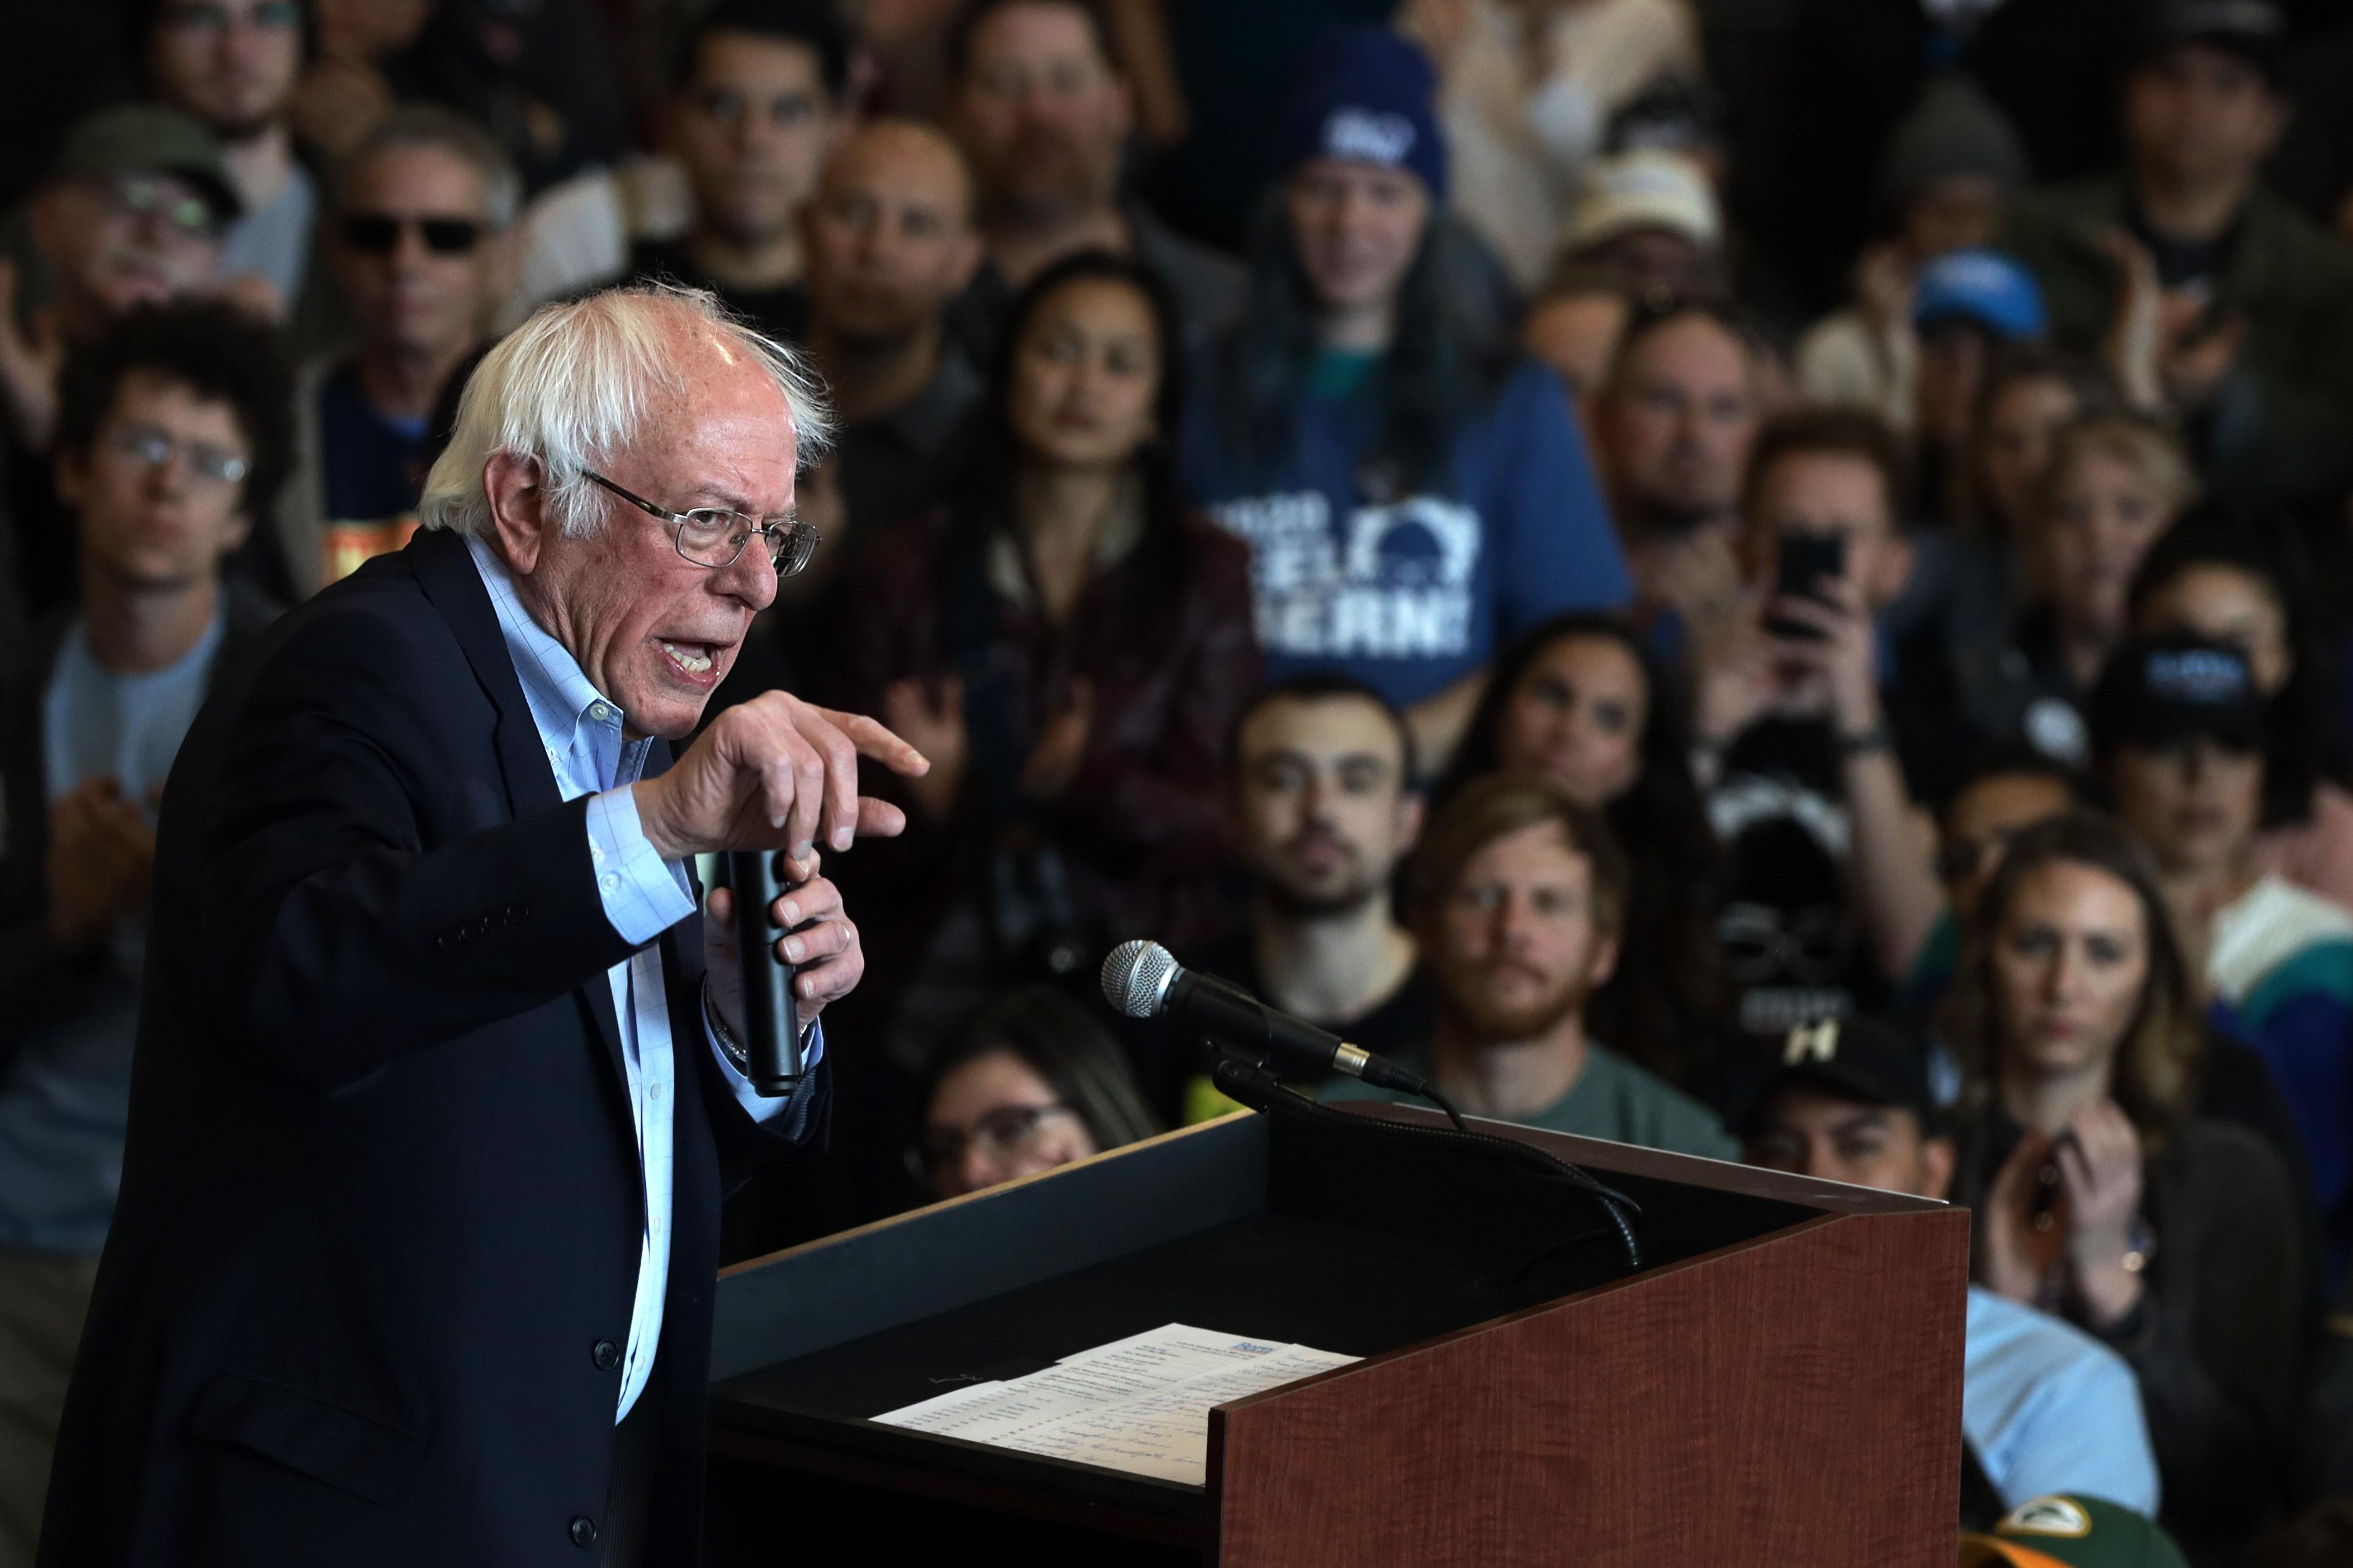 Elizabeth Warren slams Michael Bloomberg for alleged history of sexist remarks in tense Democratic debate